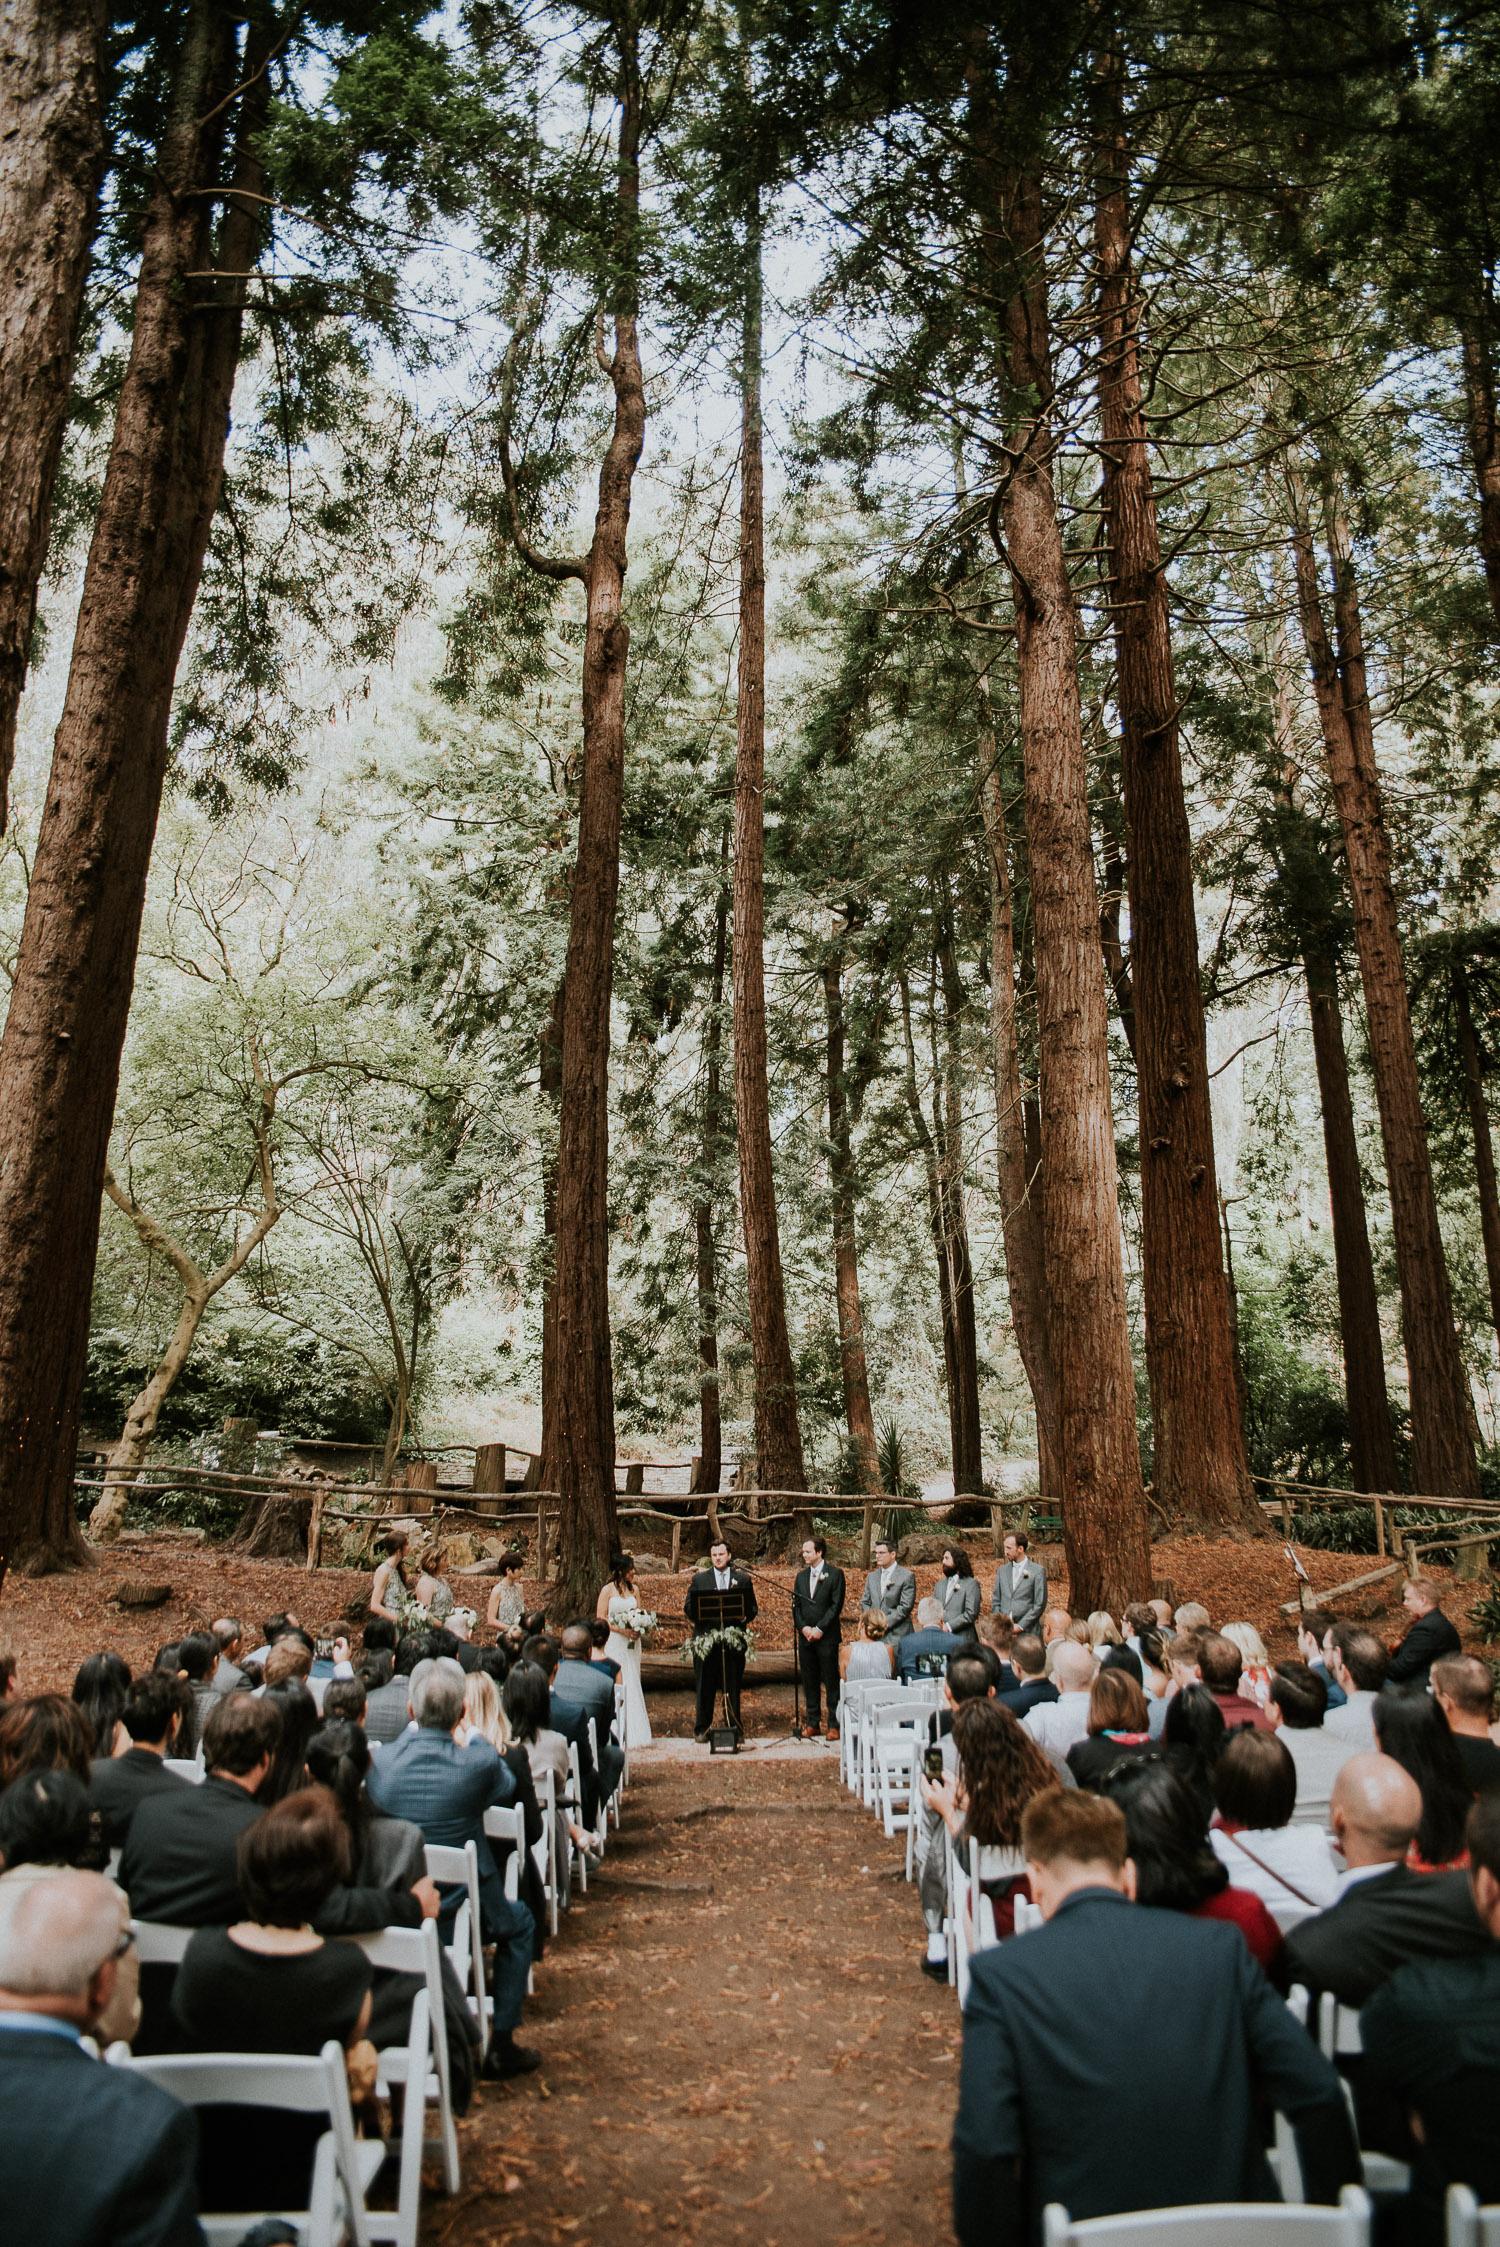 stern_grove_san_francisco_california_america_wedding_katy_webb_photography_UK52